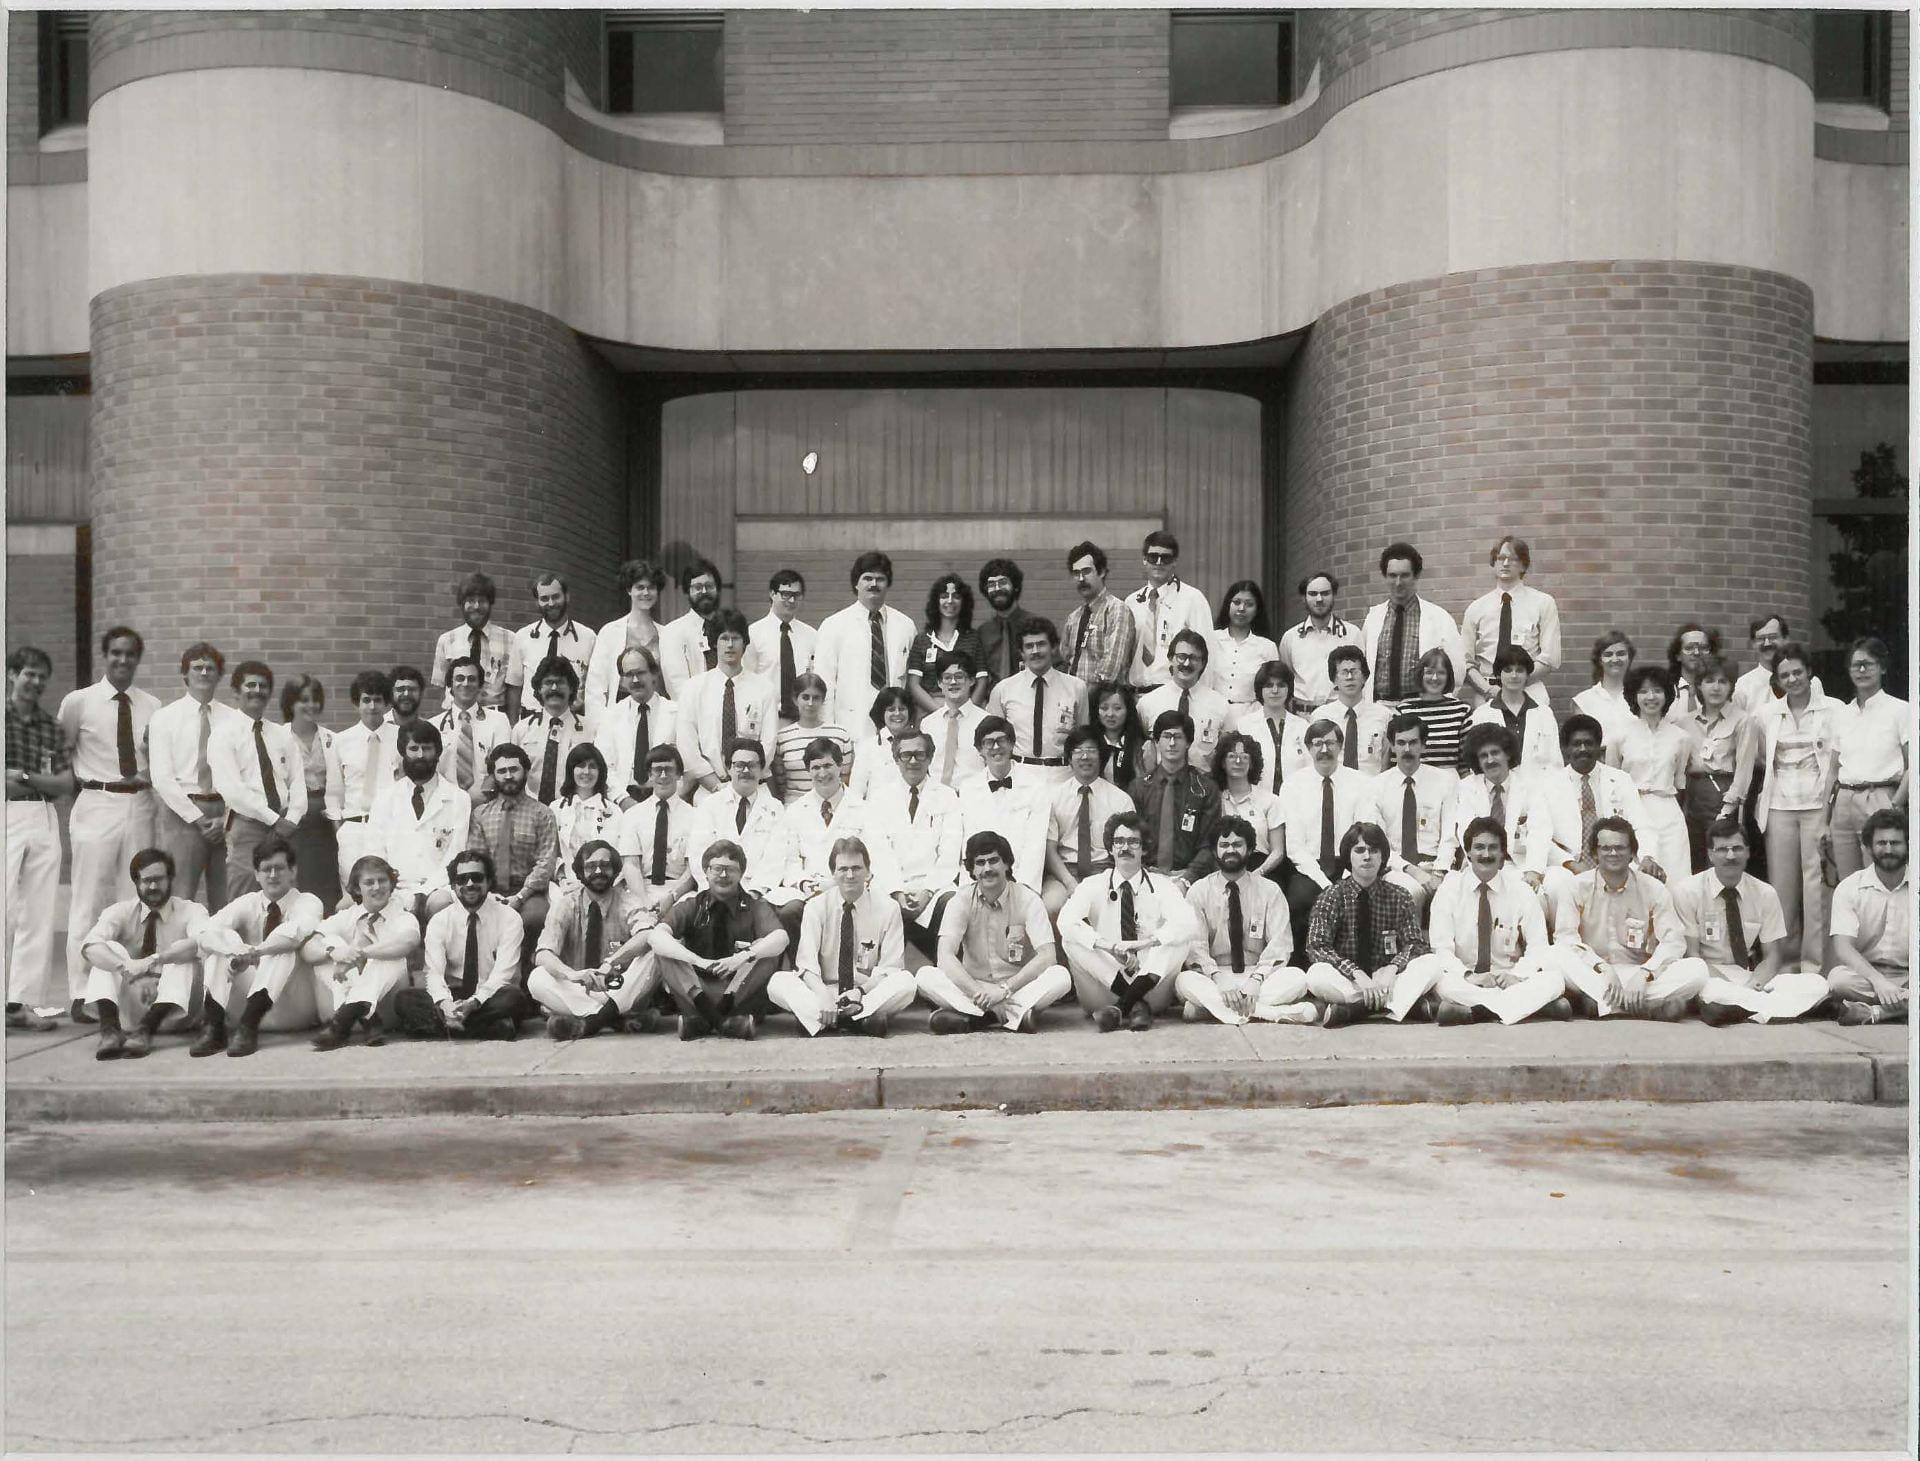 1982 Housestaff Photo